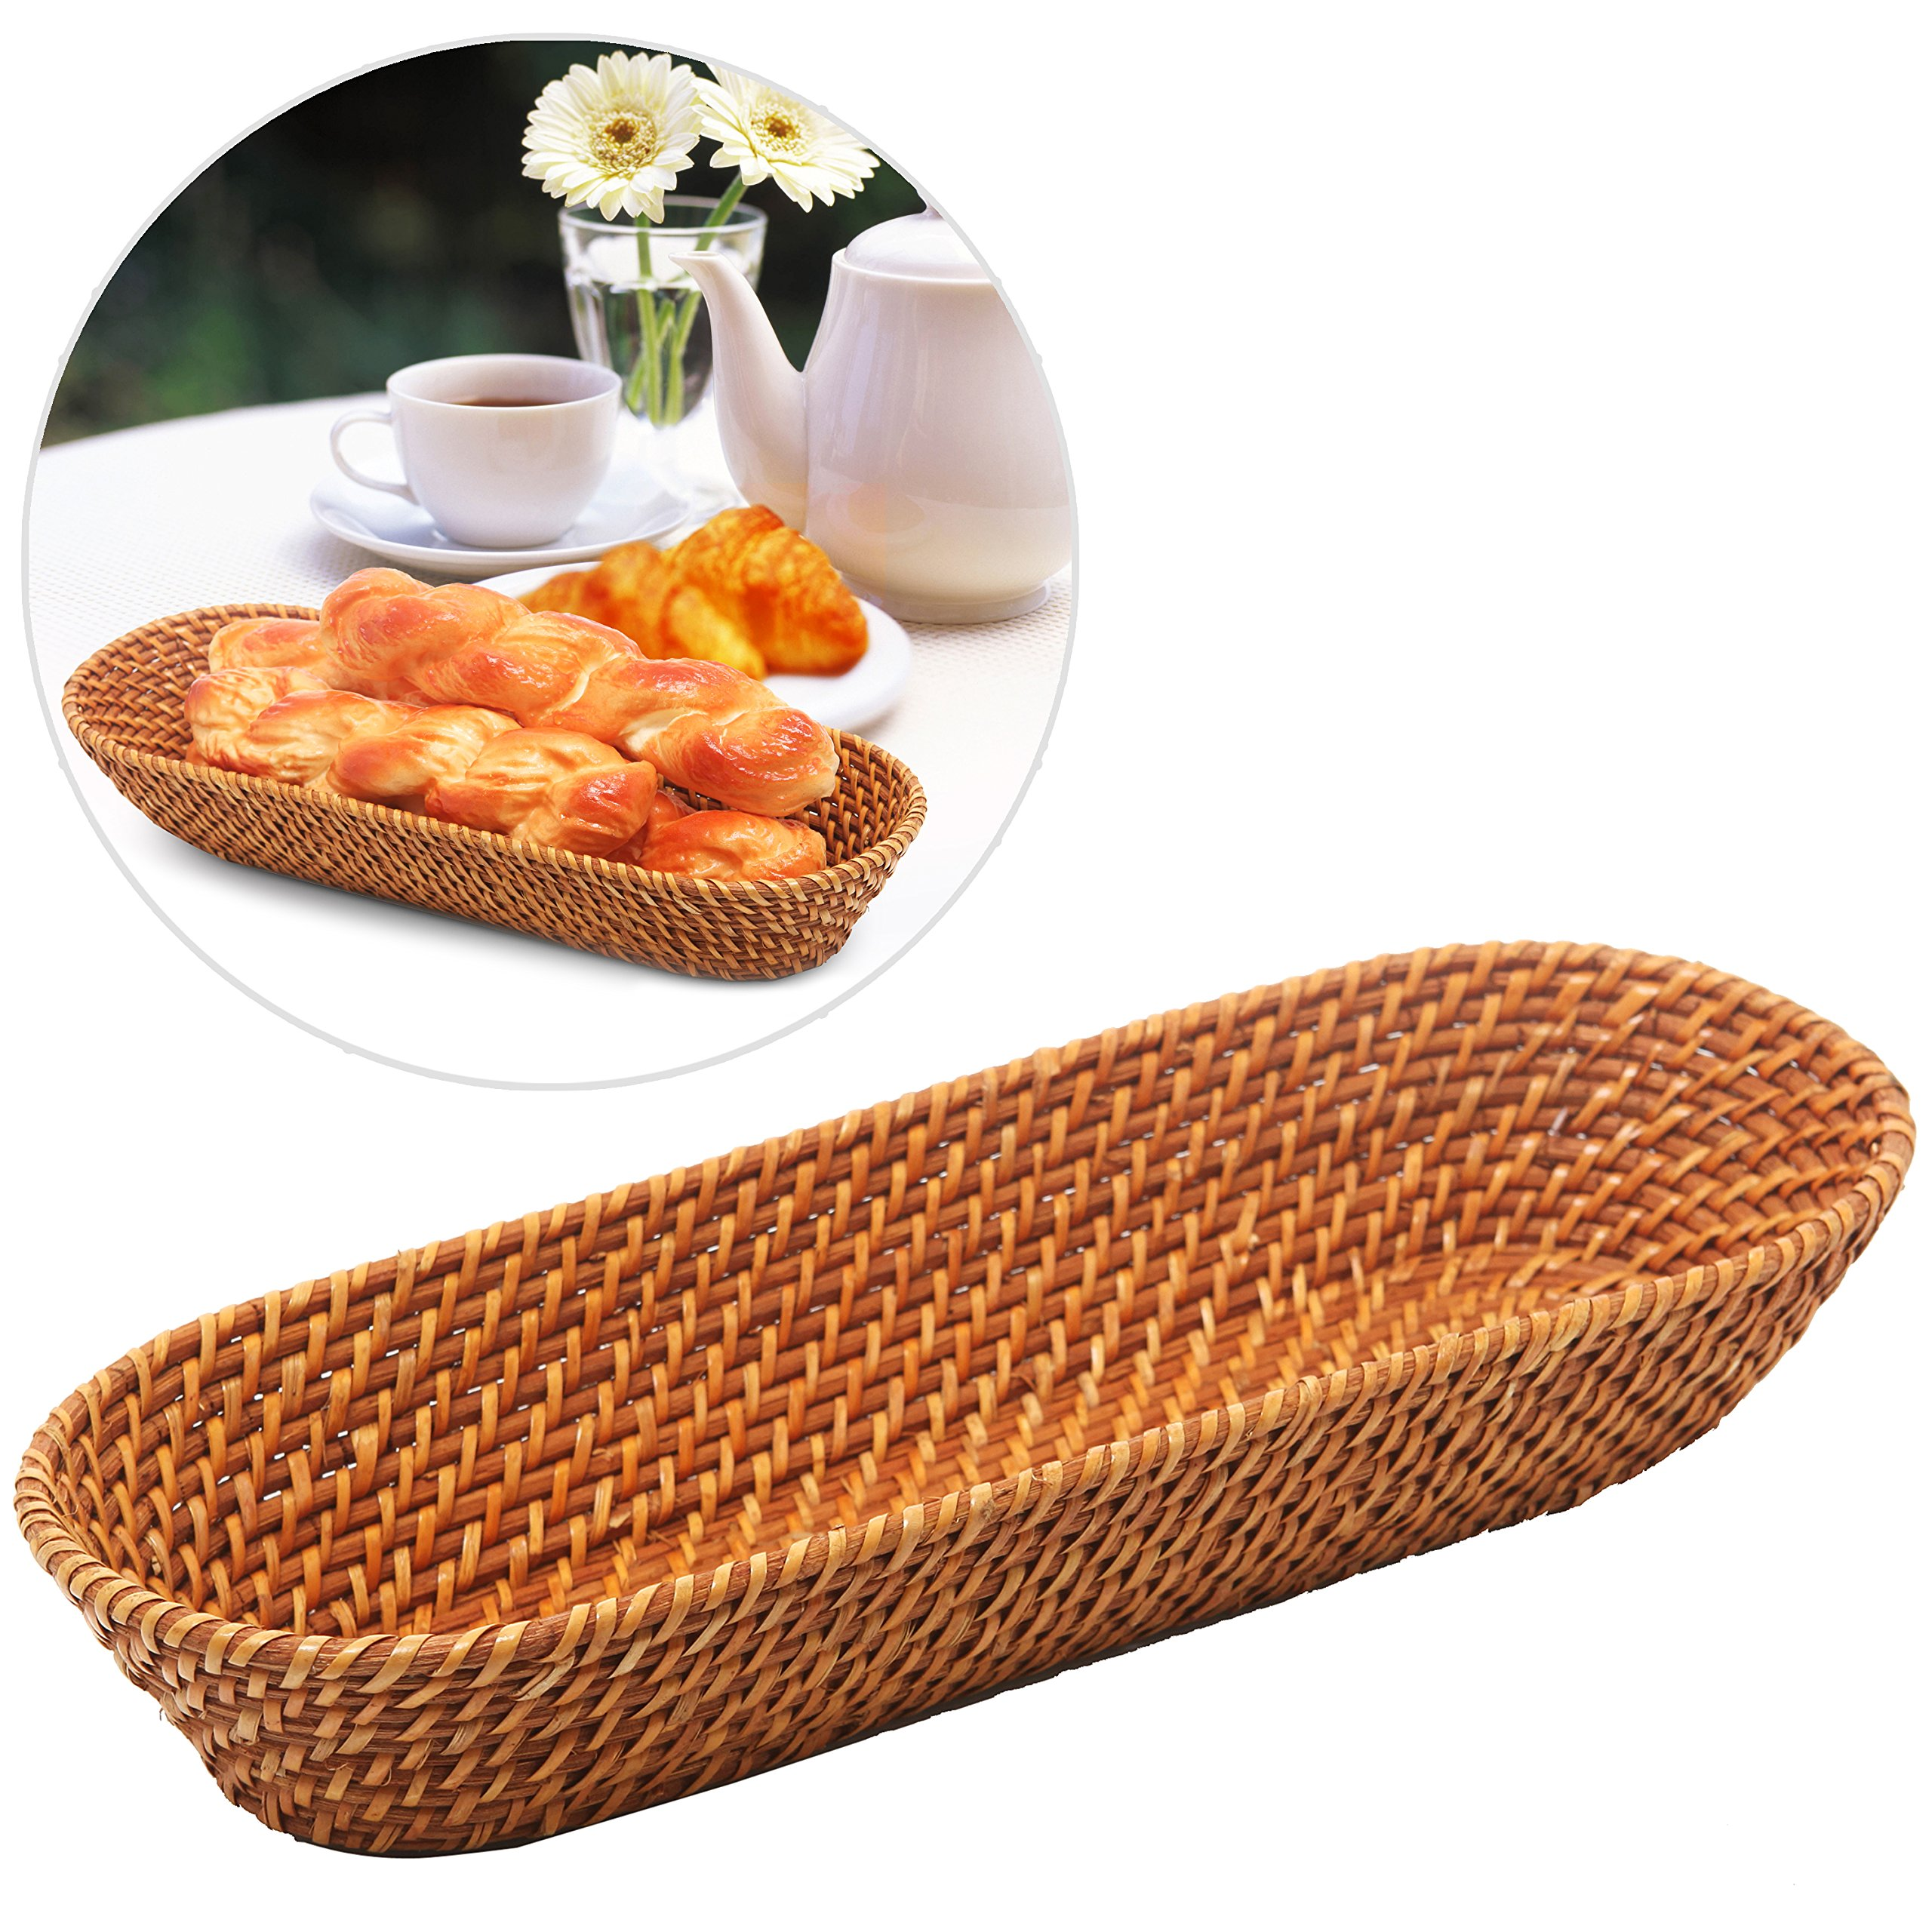 MyGift 15 Inch Rattan Bread Basket, Long Woven Tabletop Serving Platter, Brown